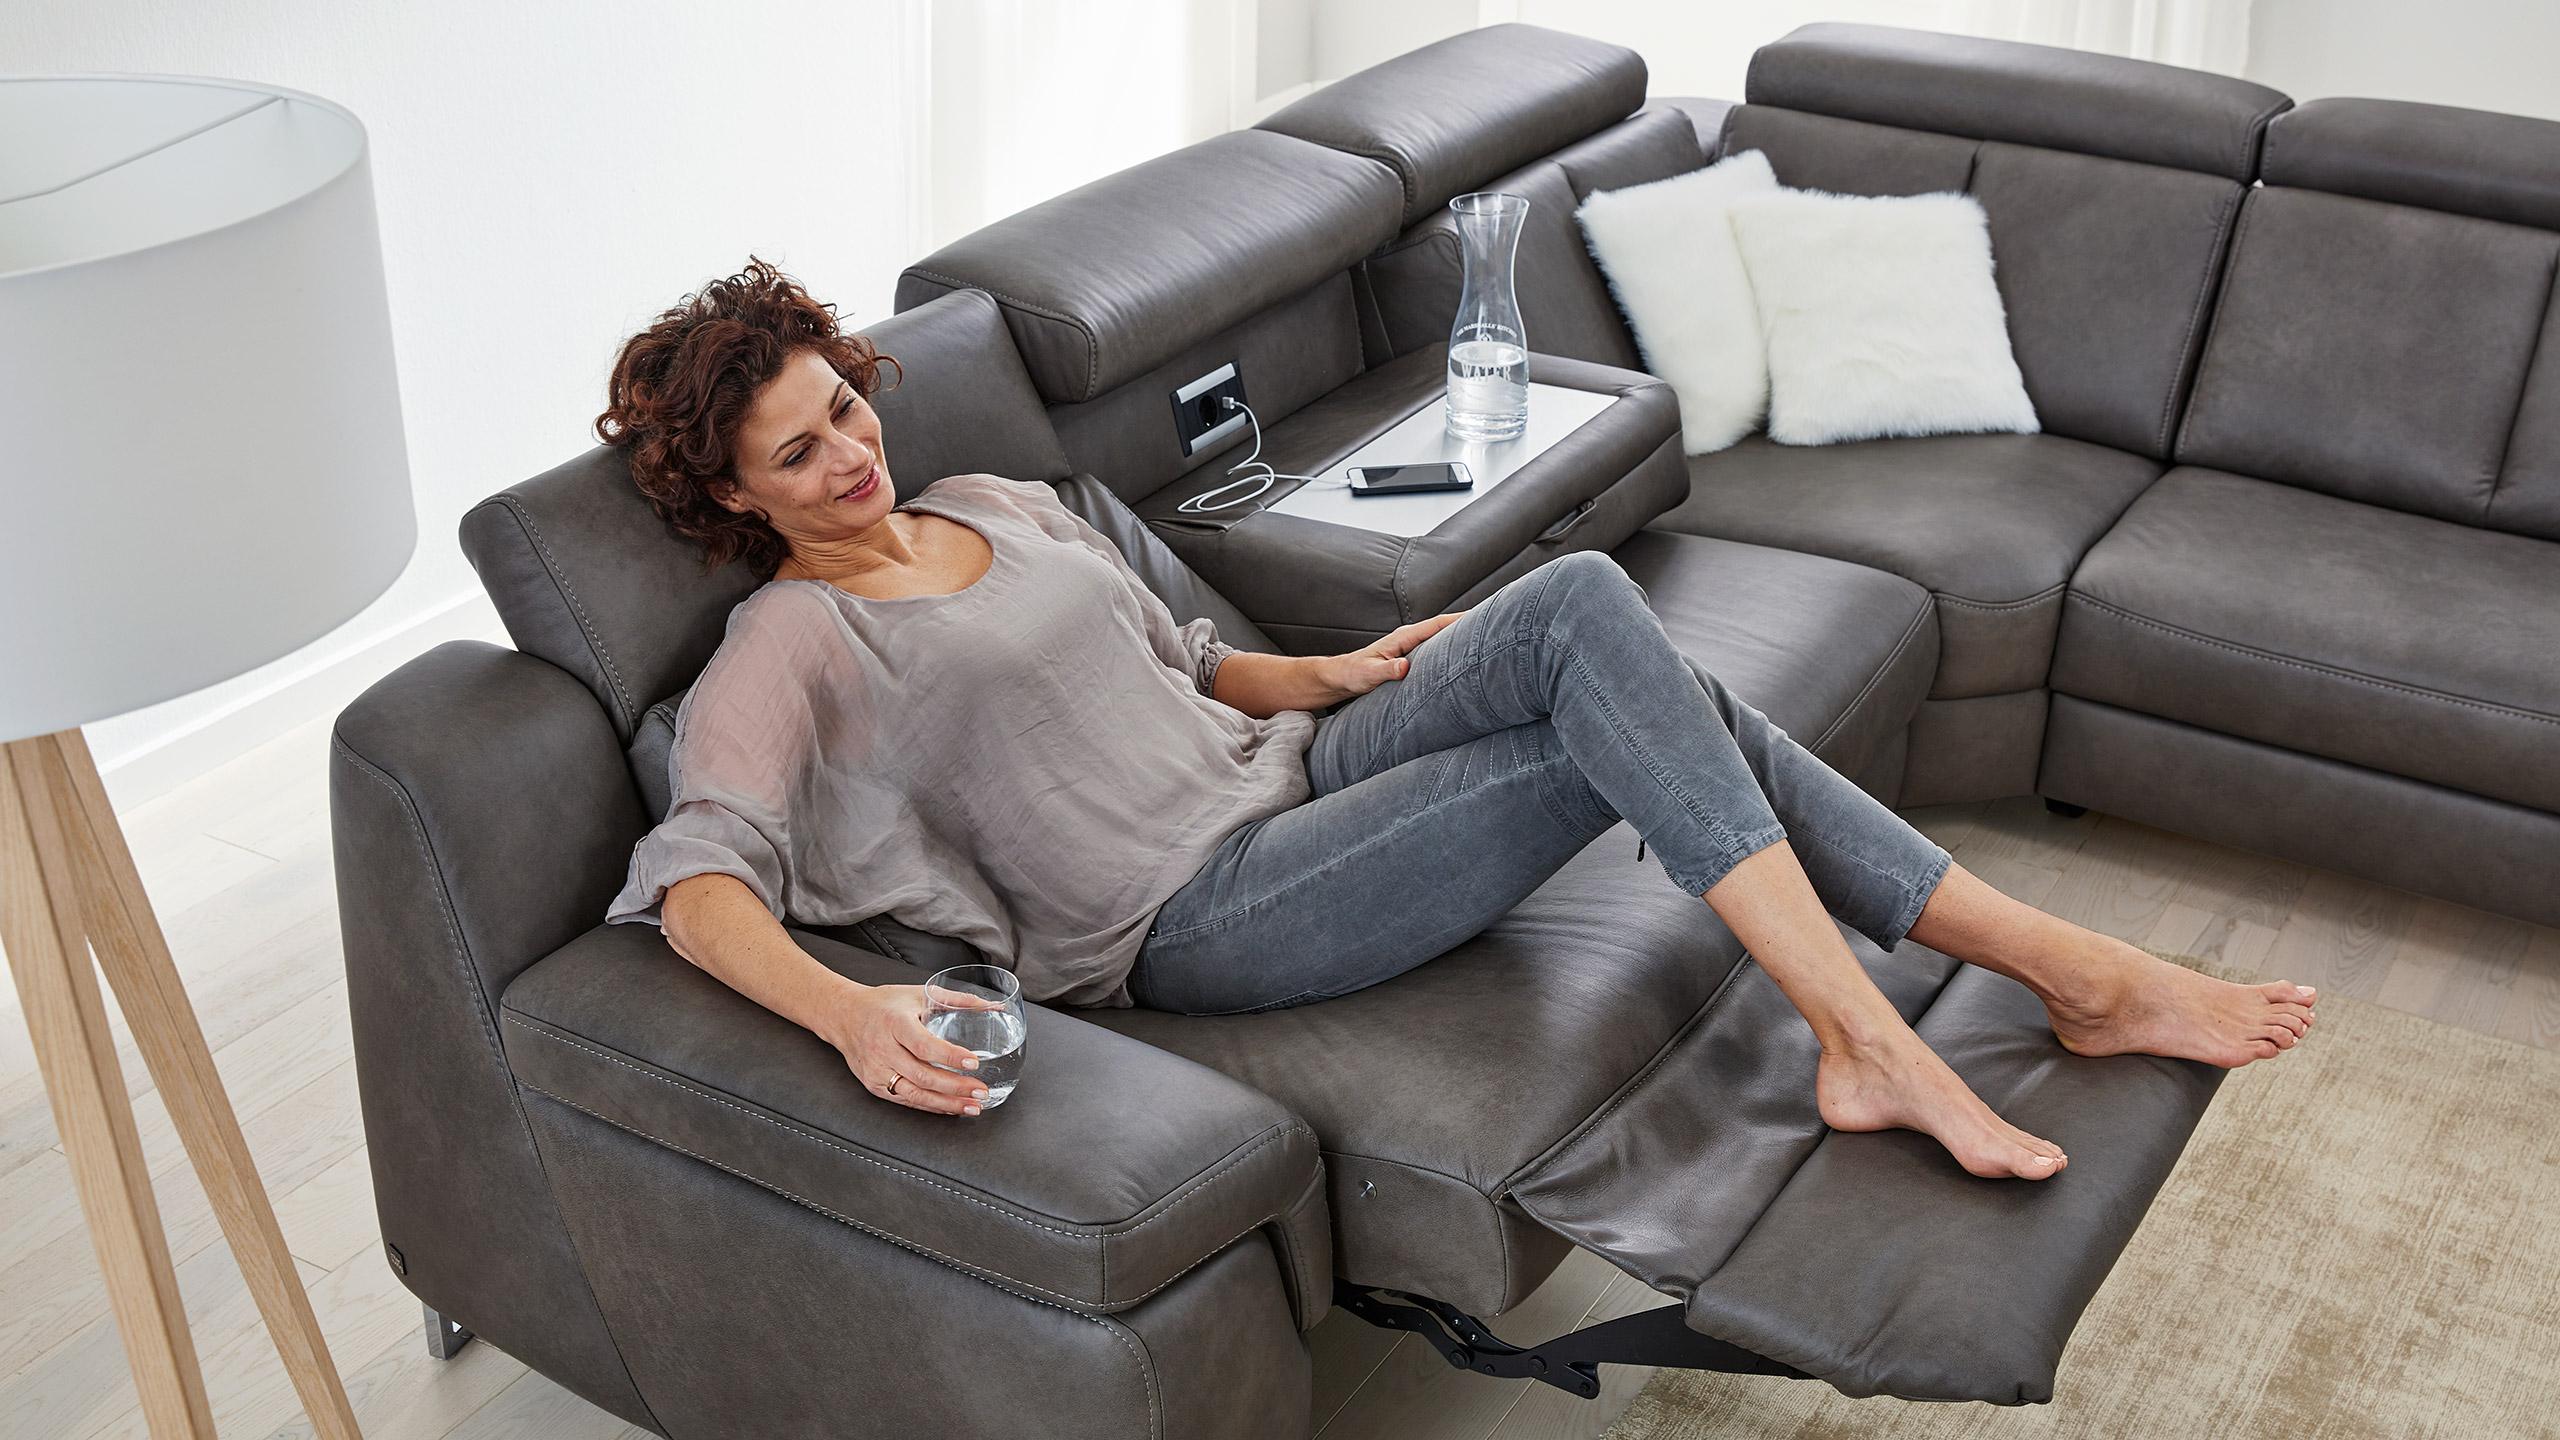 Interliving-Sofa-Serie-4050-Lesen-Wall-free-Knopfdruck-Stromanschluss-Leder